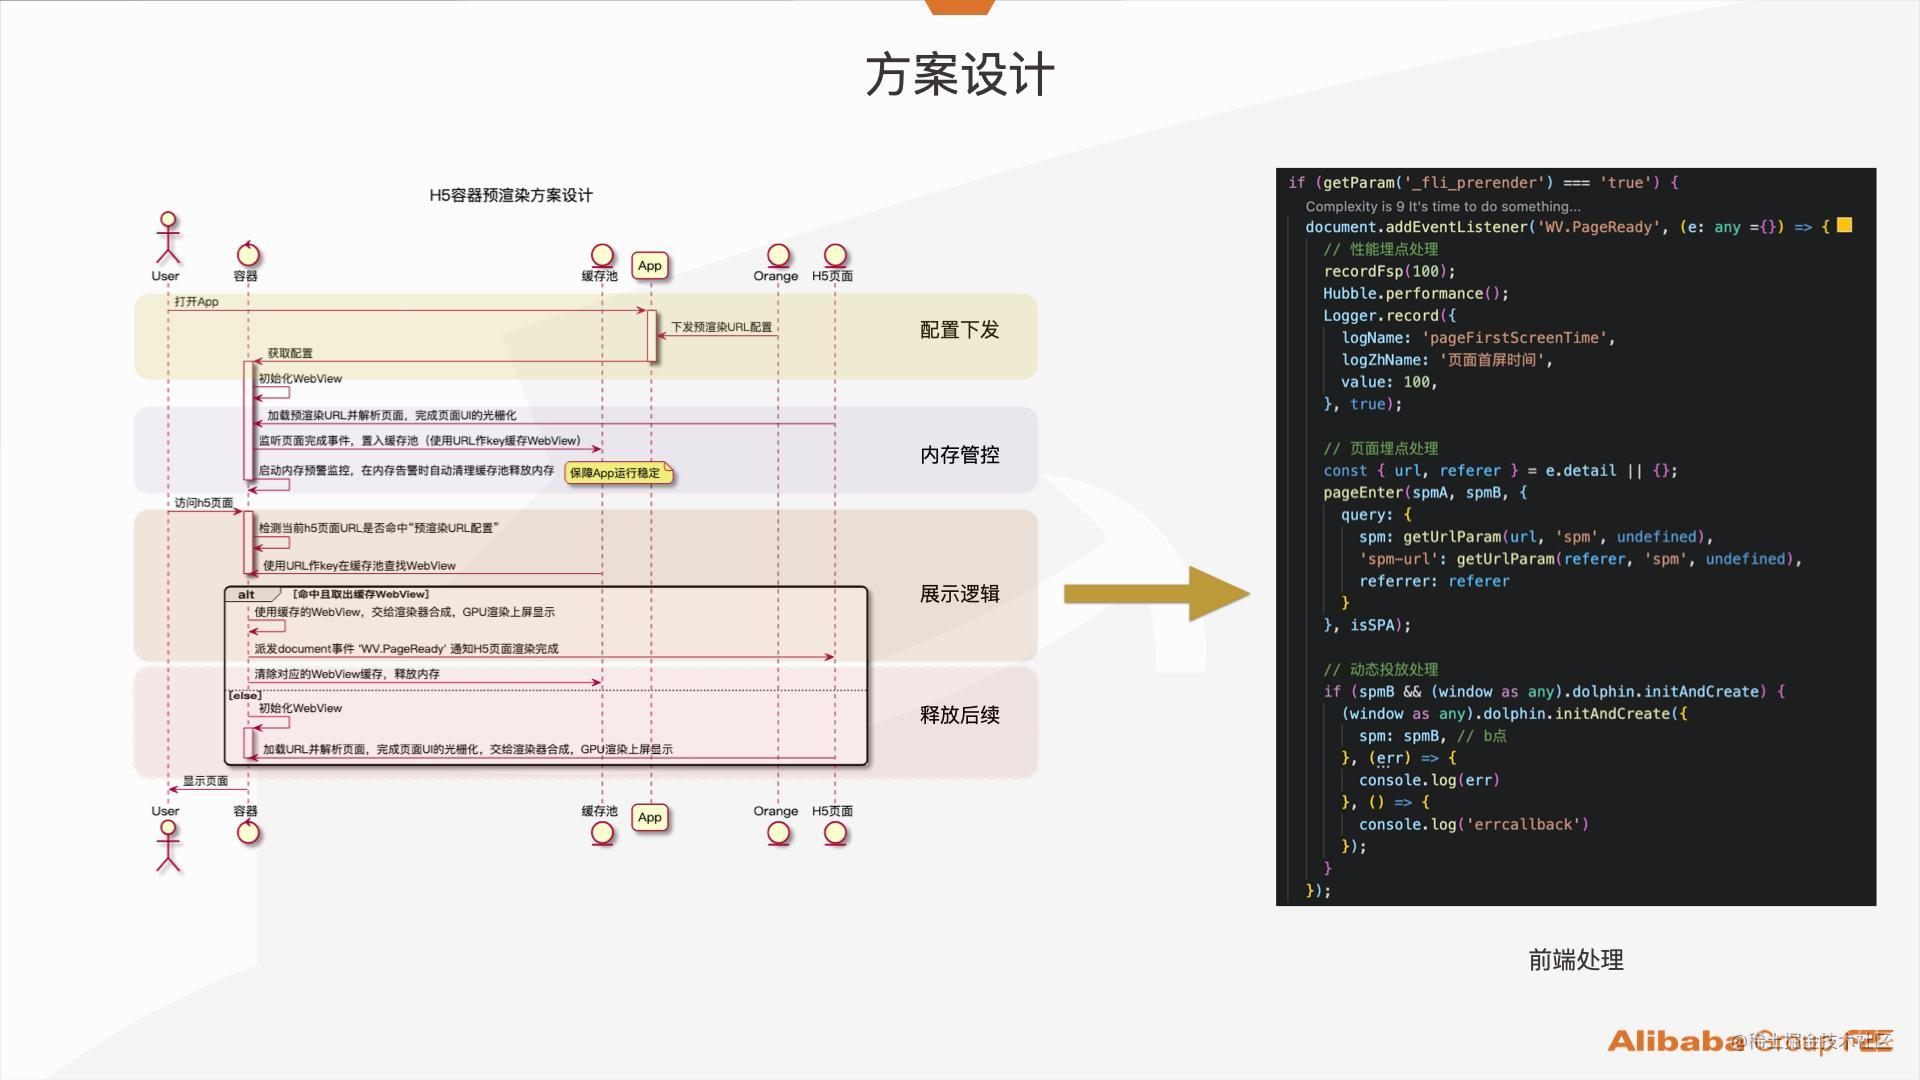 C18-7 太吾-如何在双11大促中实现会场页面秒开.010.jpeg